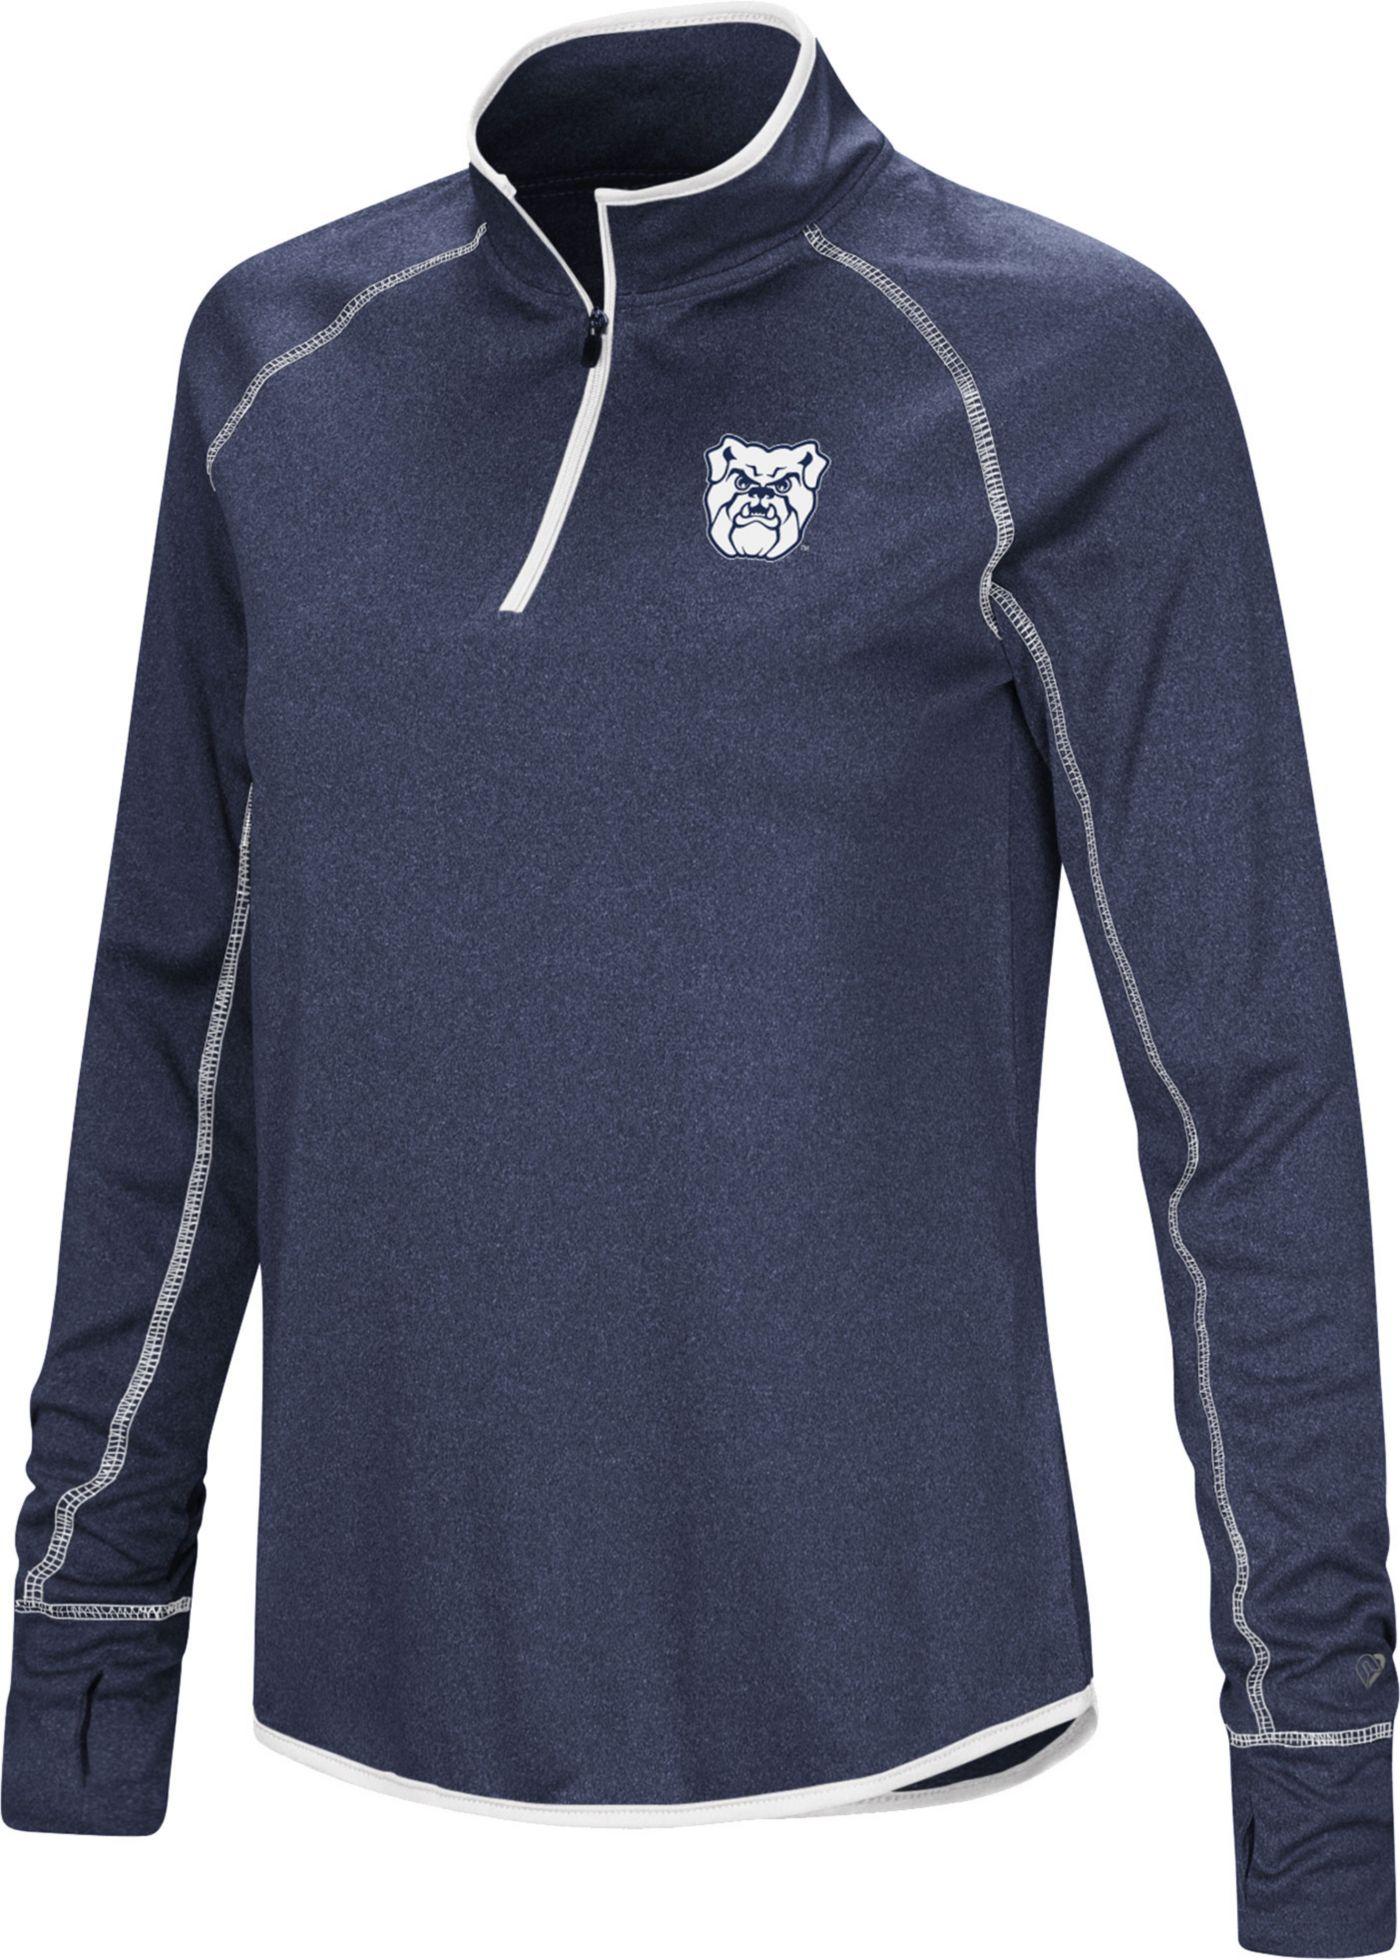 Colosseum Women's Butler Bulldogs Blue Stingray Quarter-Zip Shirt